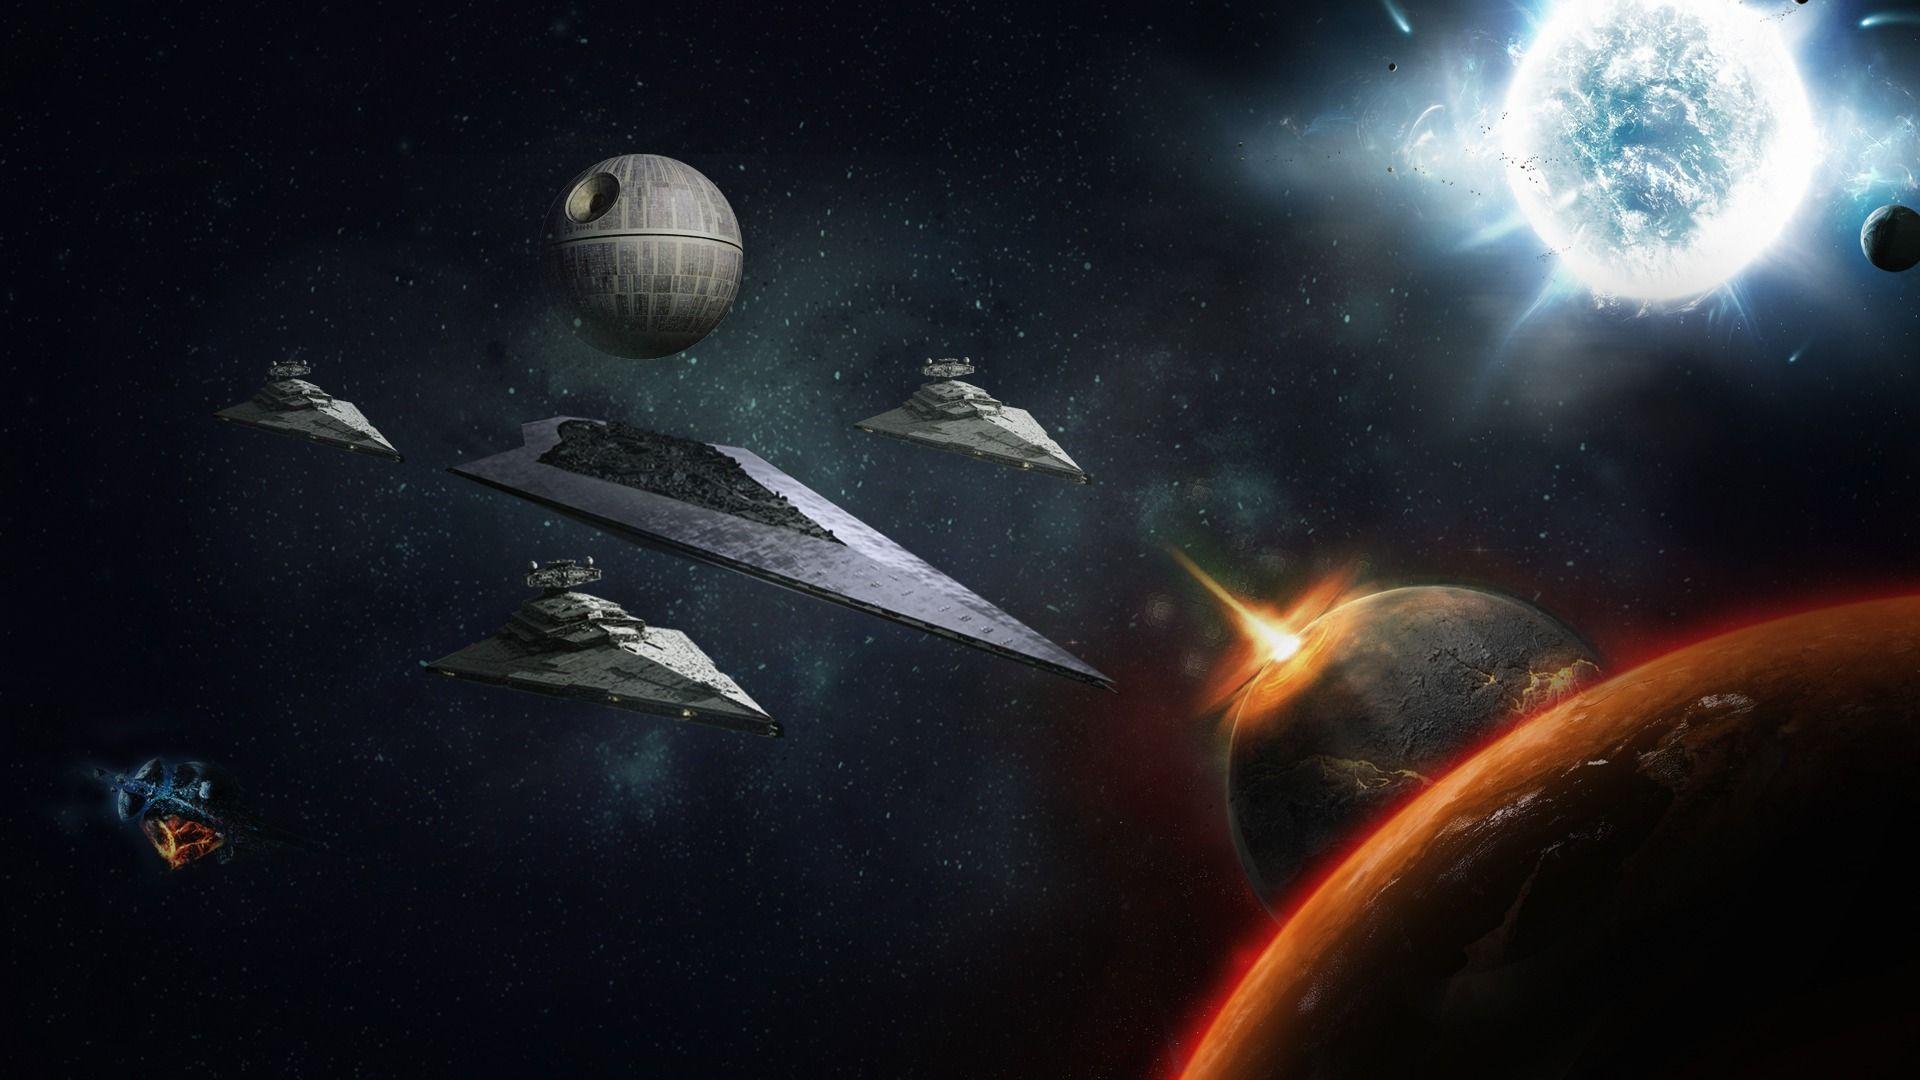 Star Wars Death Star Wallpaper Sf Wallpaper